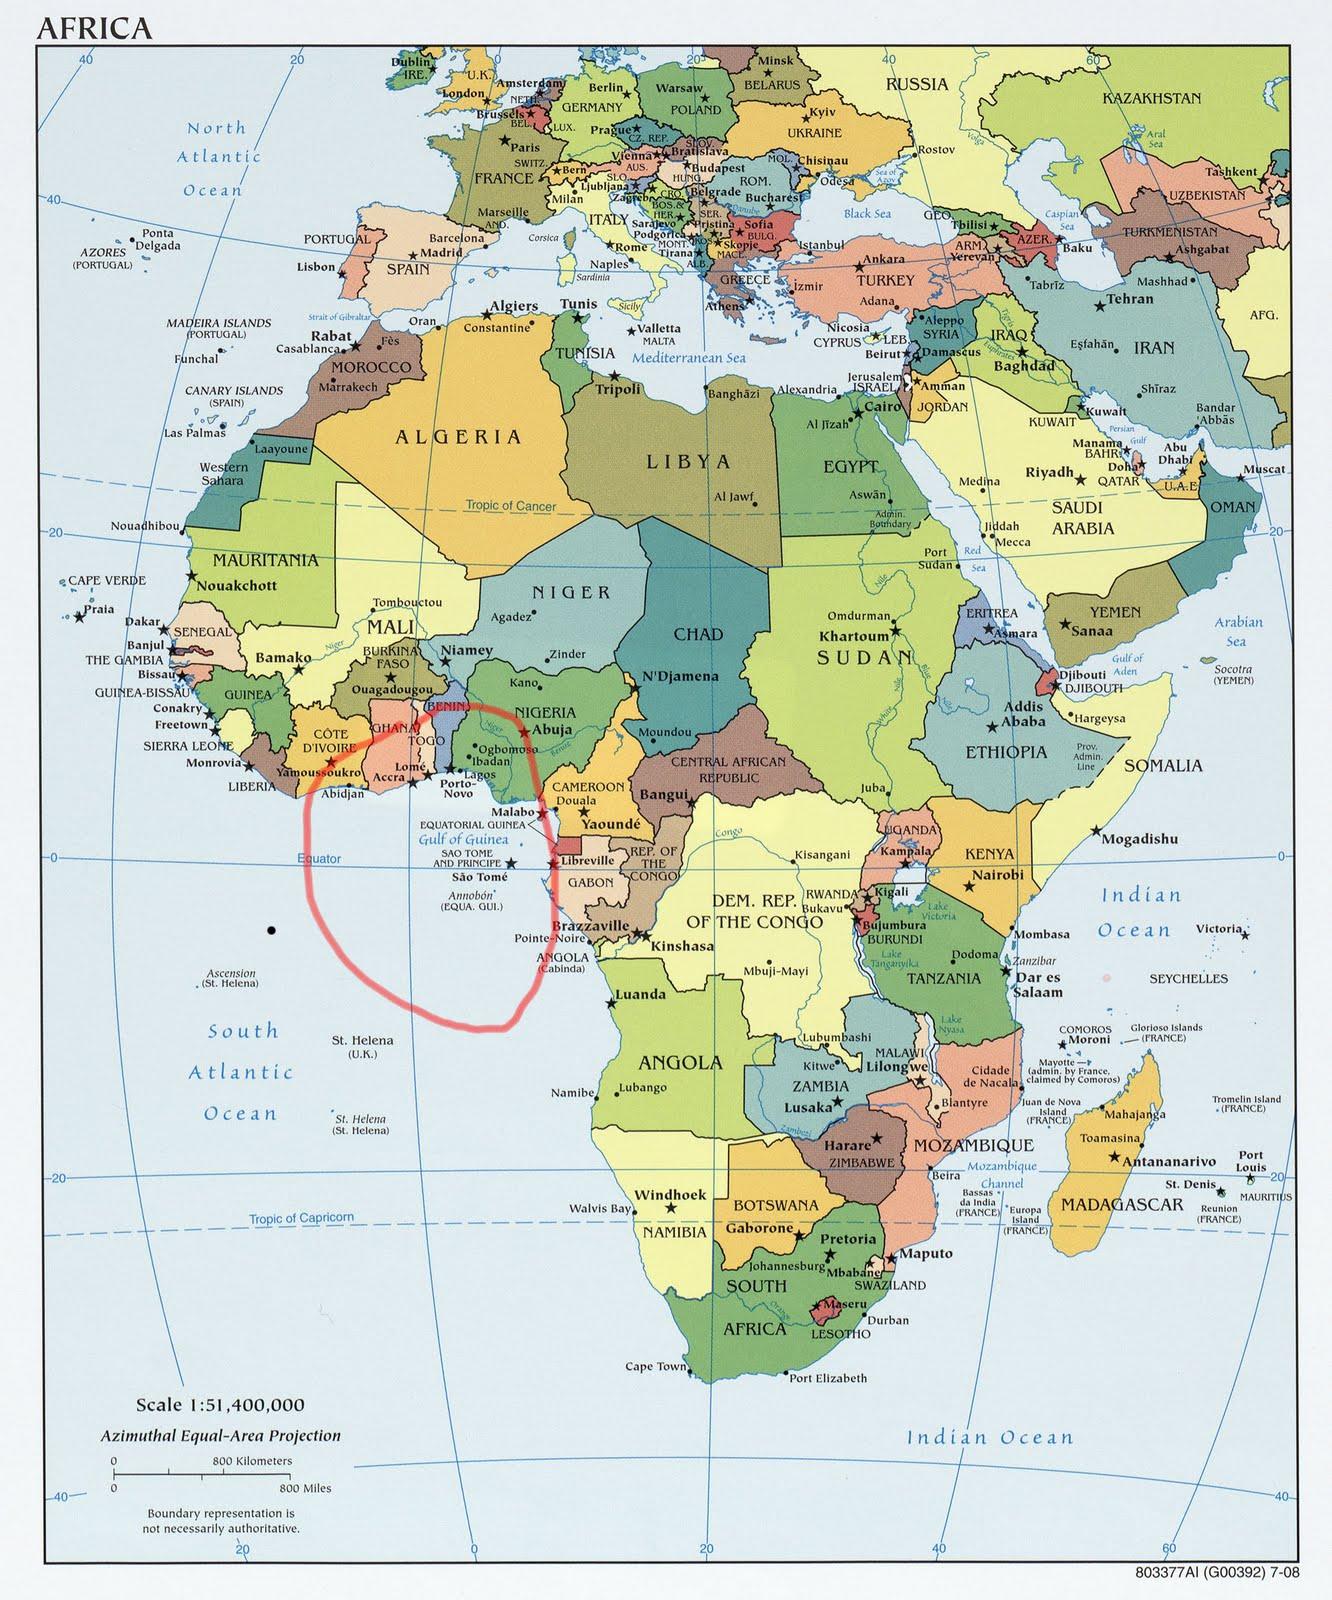 africa map gulf of guinea